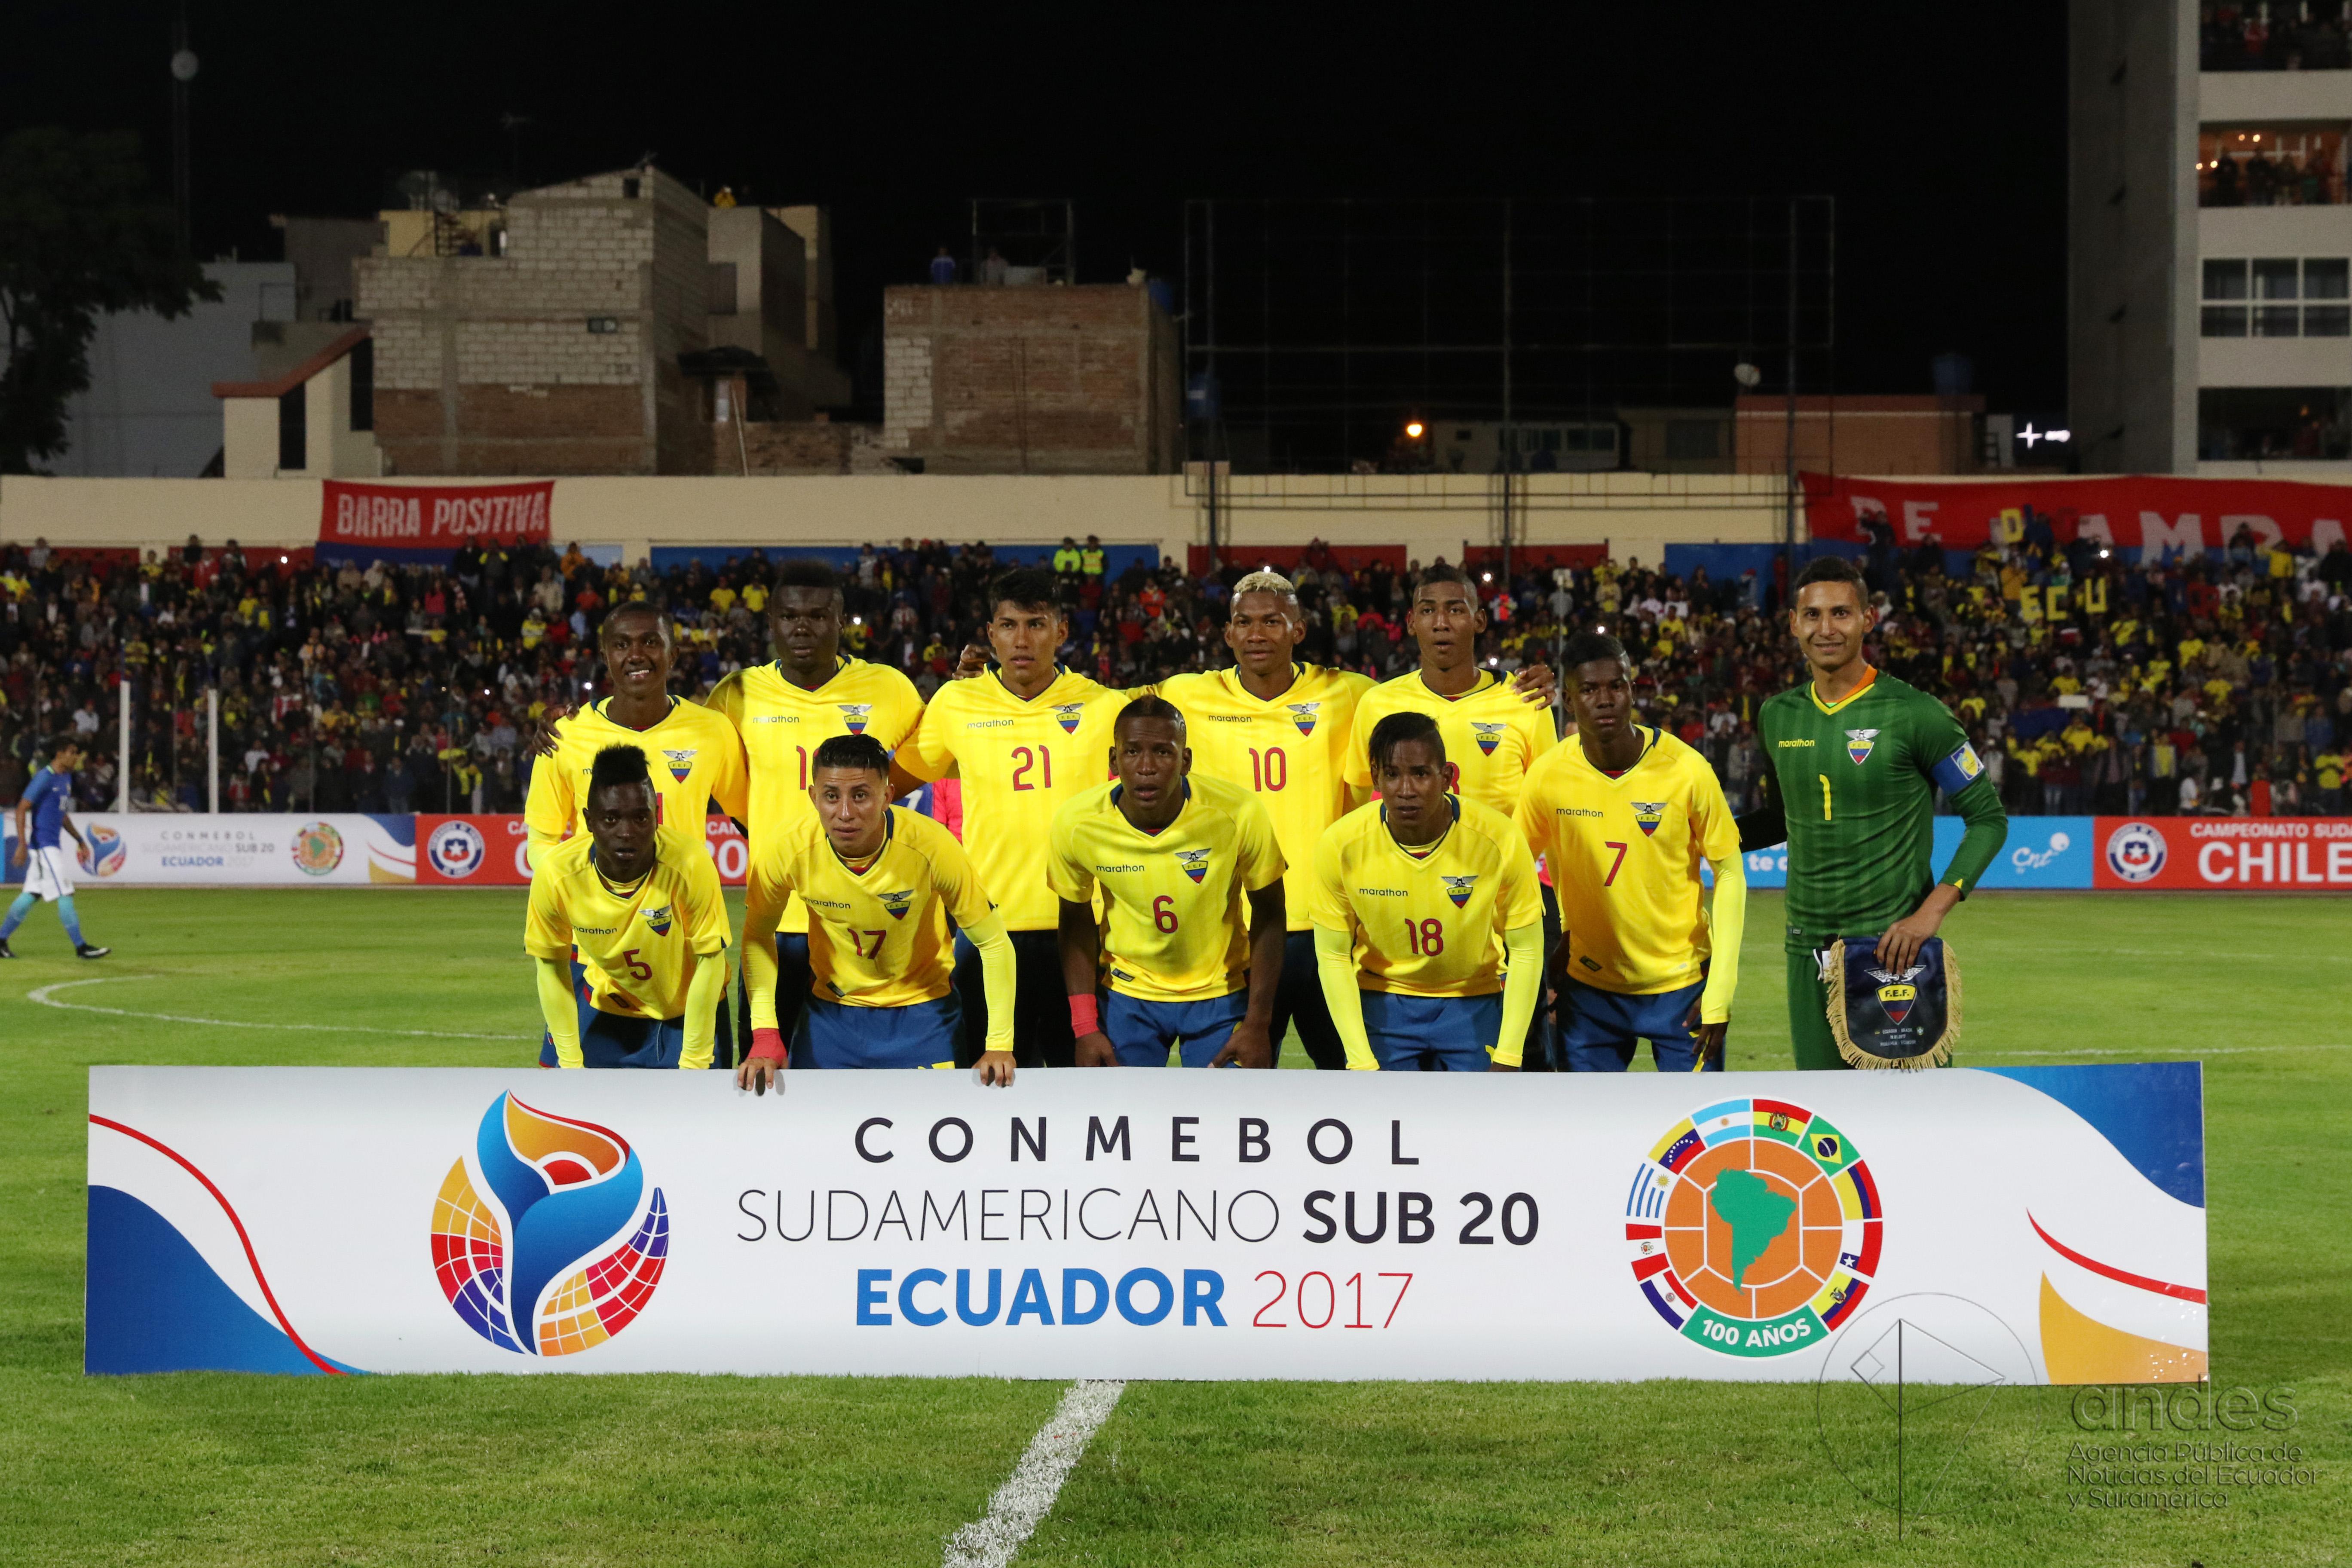 Brasil Sub 20: File:ECUADOR-BRASIL SUB 20 (32395163365).jpg